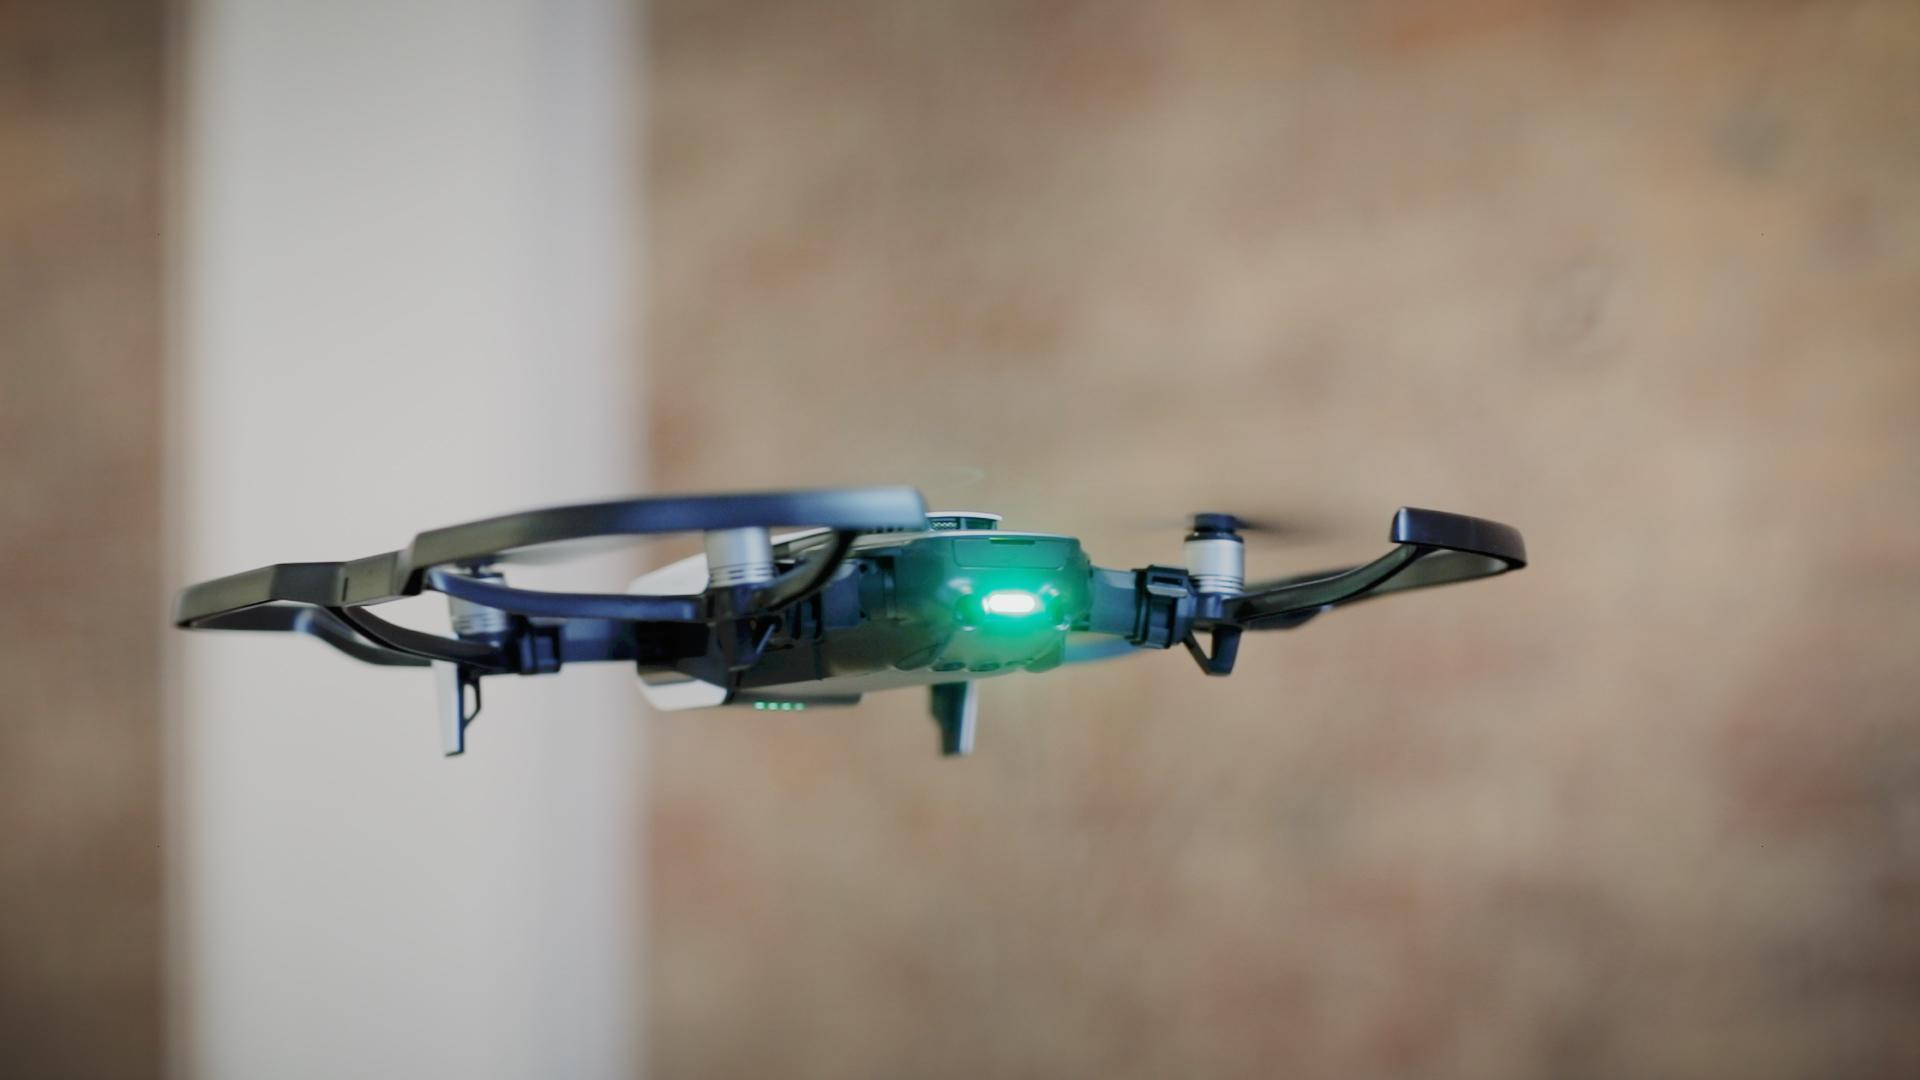 DJI's $799 'smartphone-size' Mavic Air drone starts shipping January 28